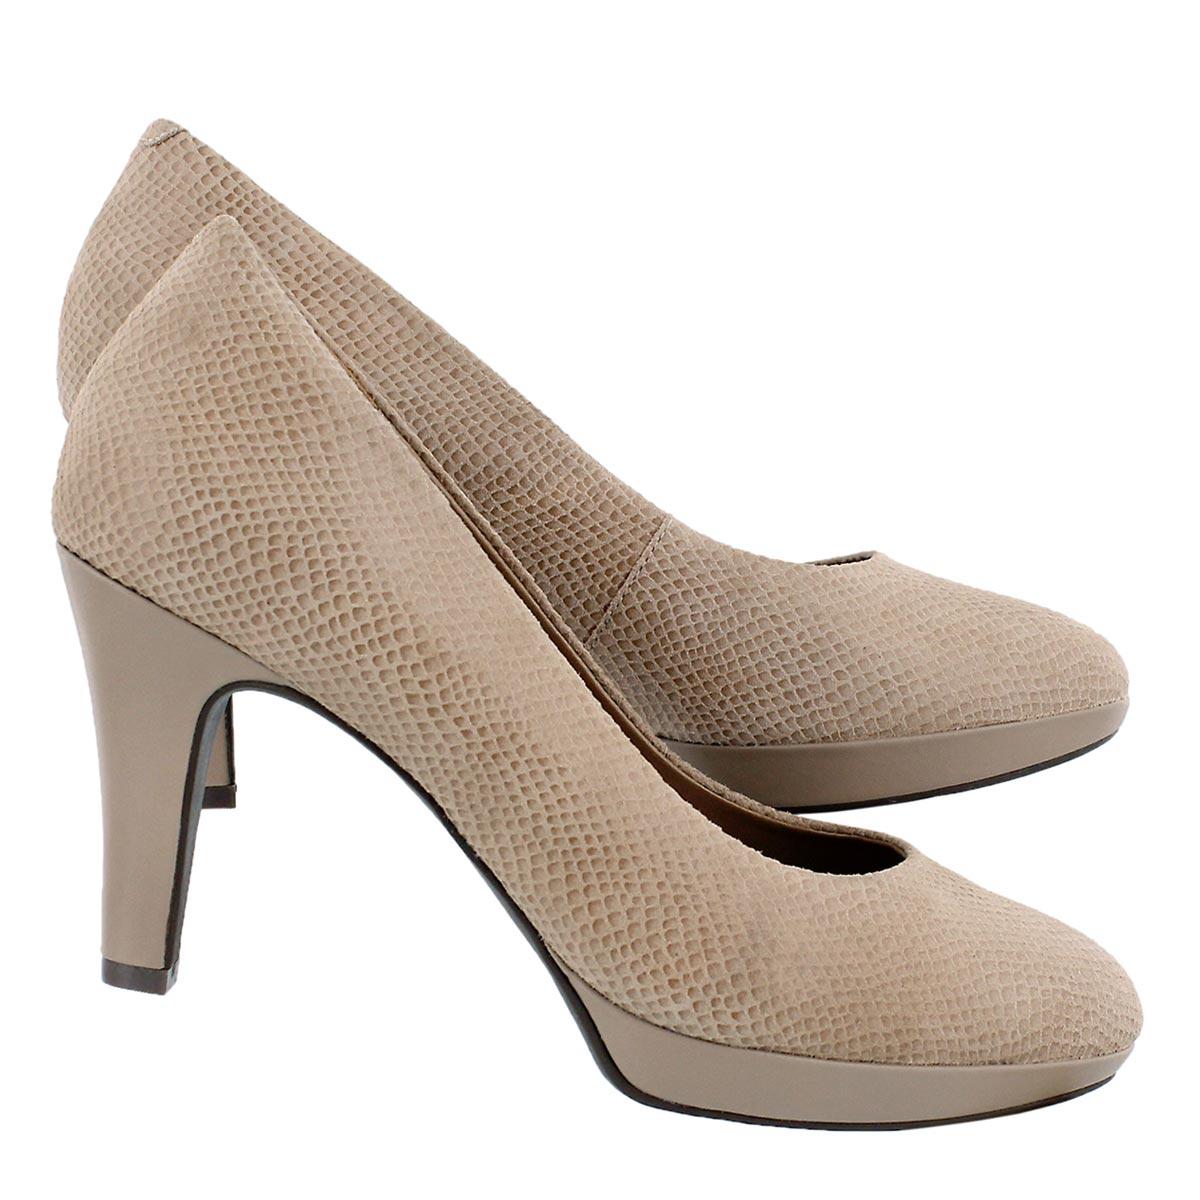 Lds Brier Dolly sand snake dress heel